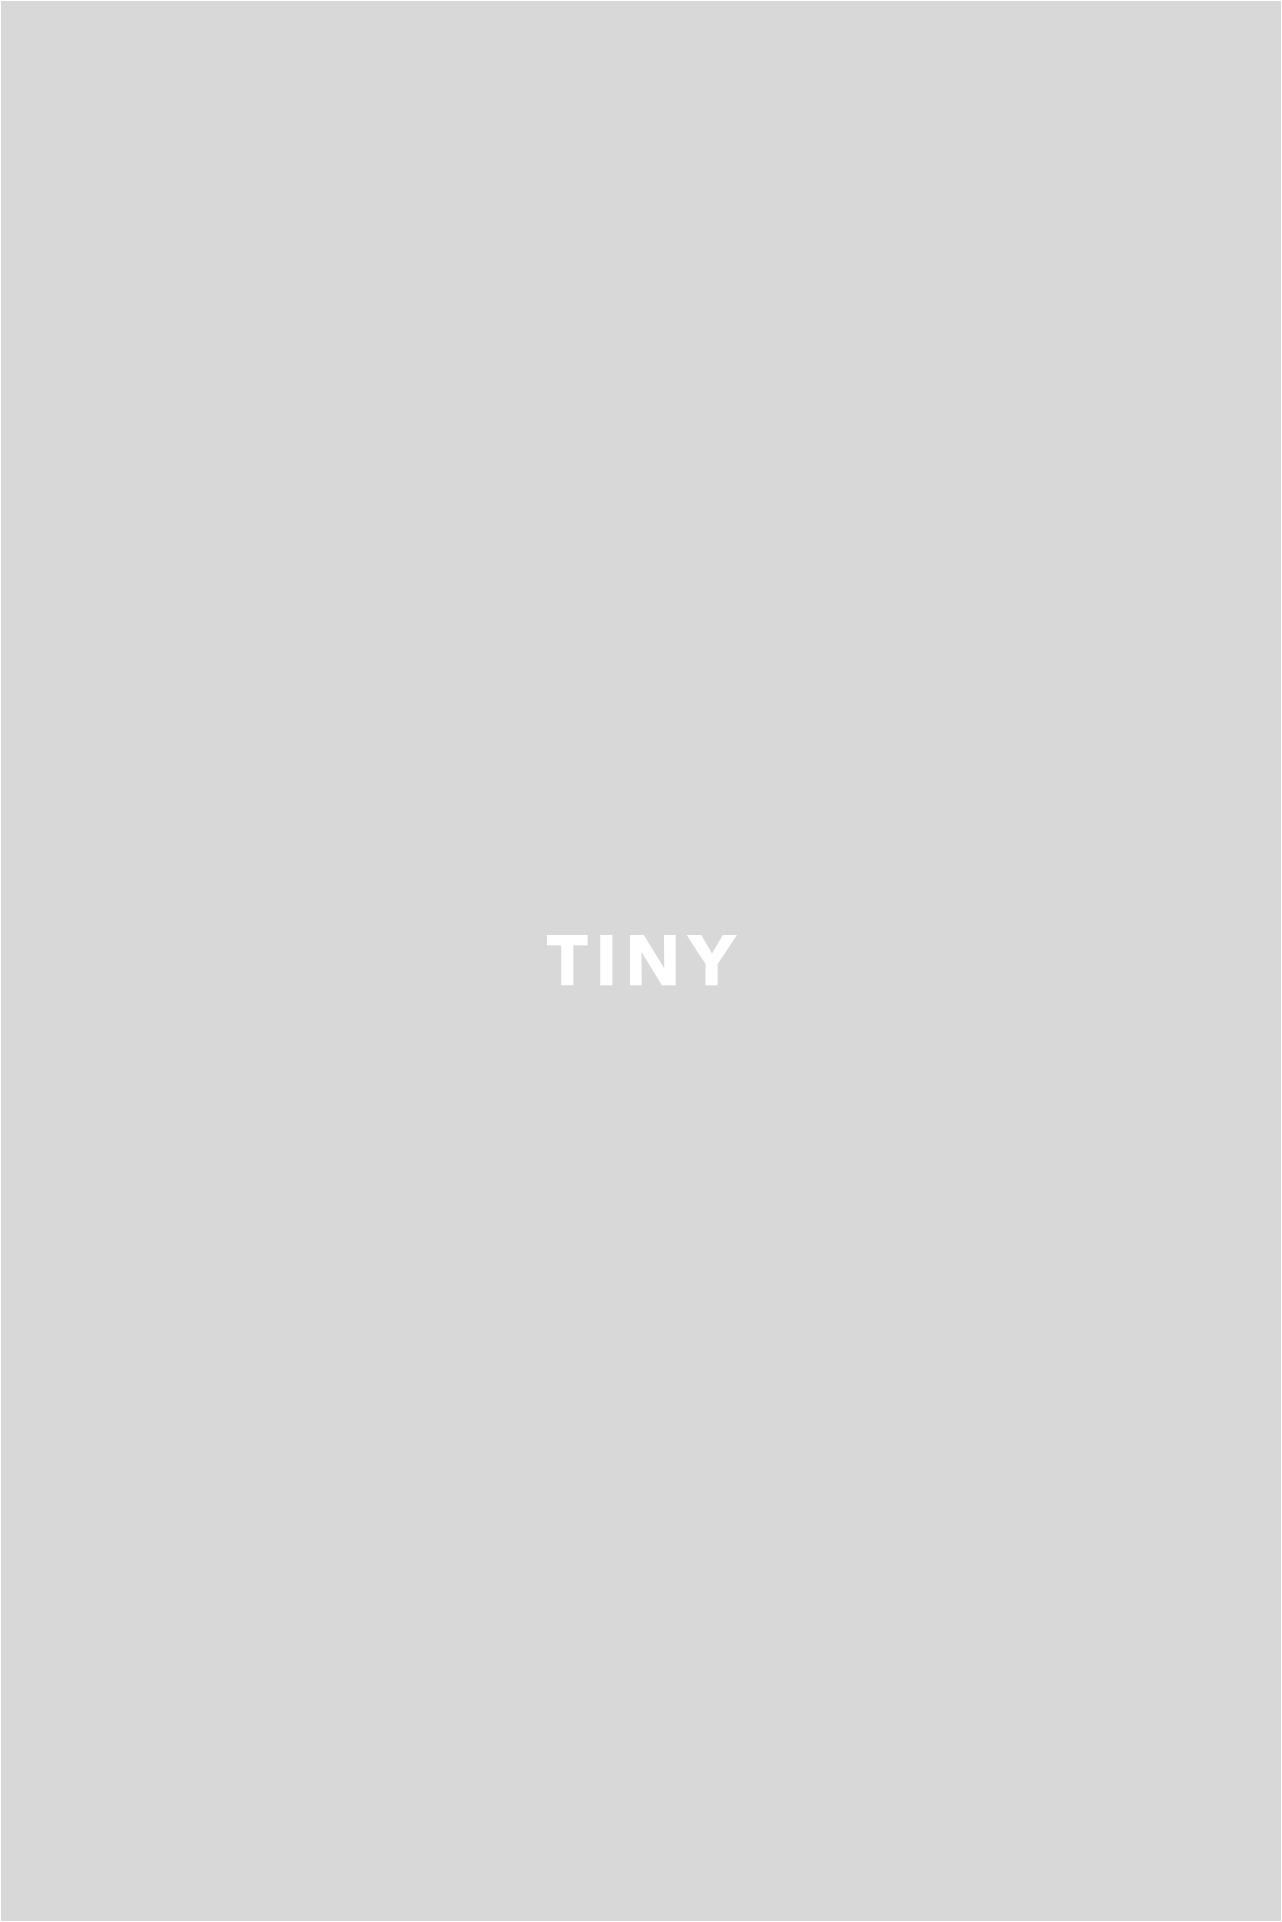 Adidas Gazelle - scarlet/ftwr white/gold met